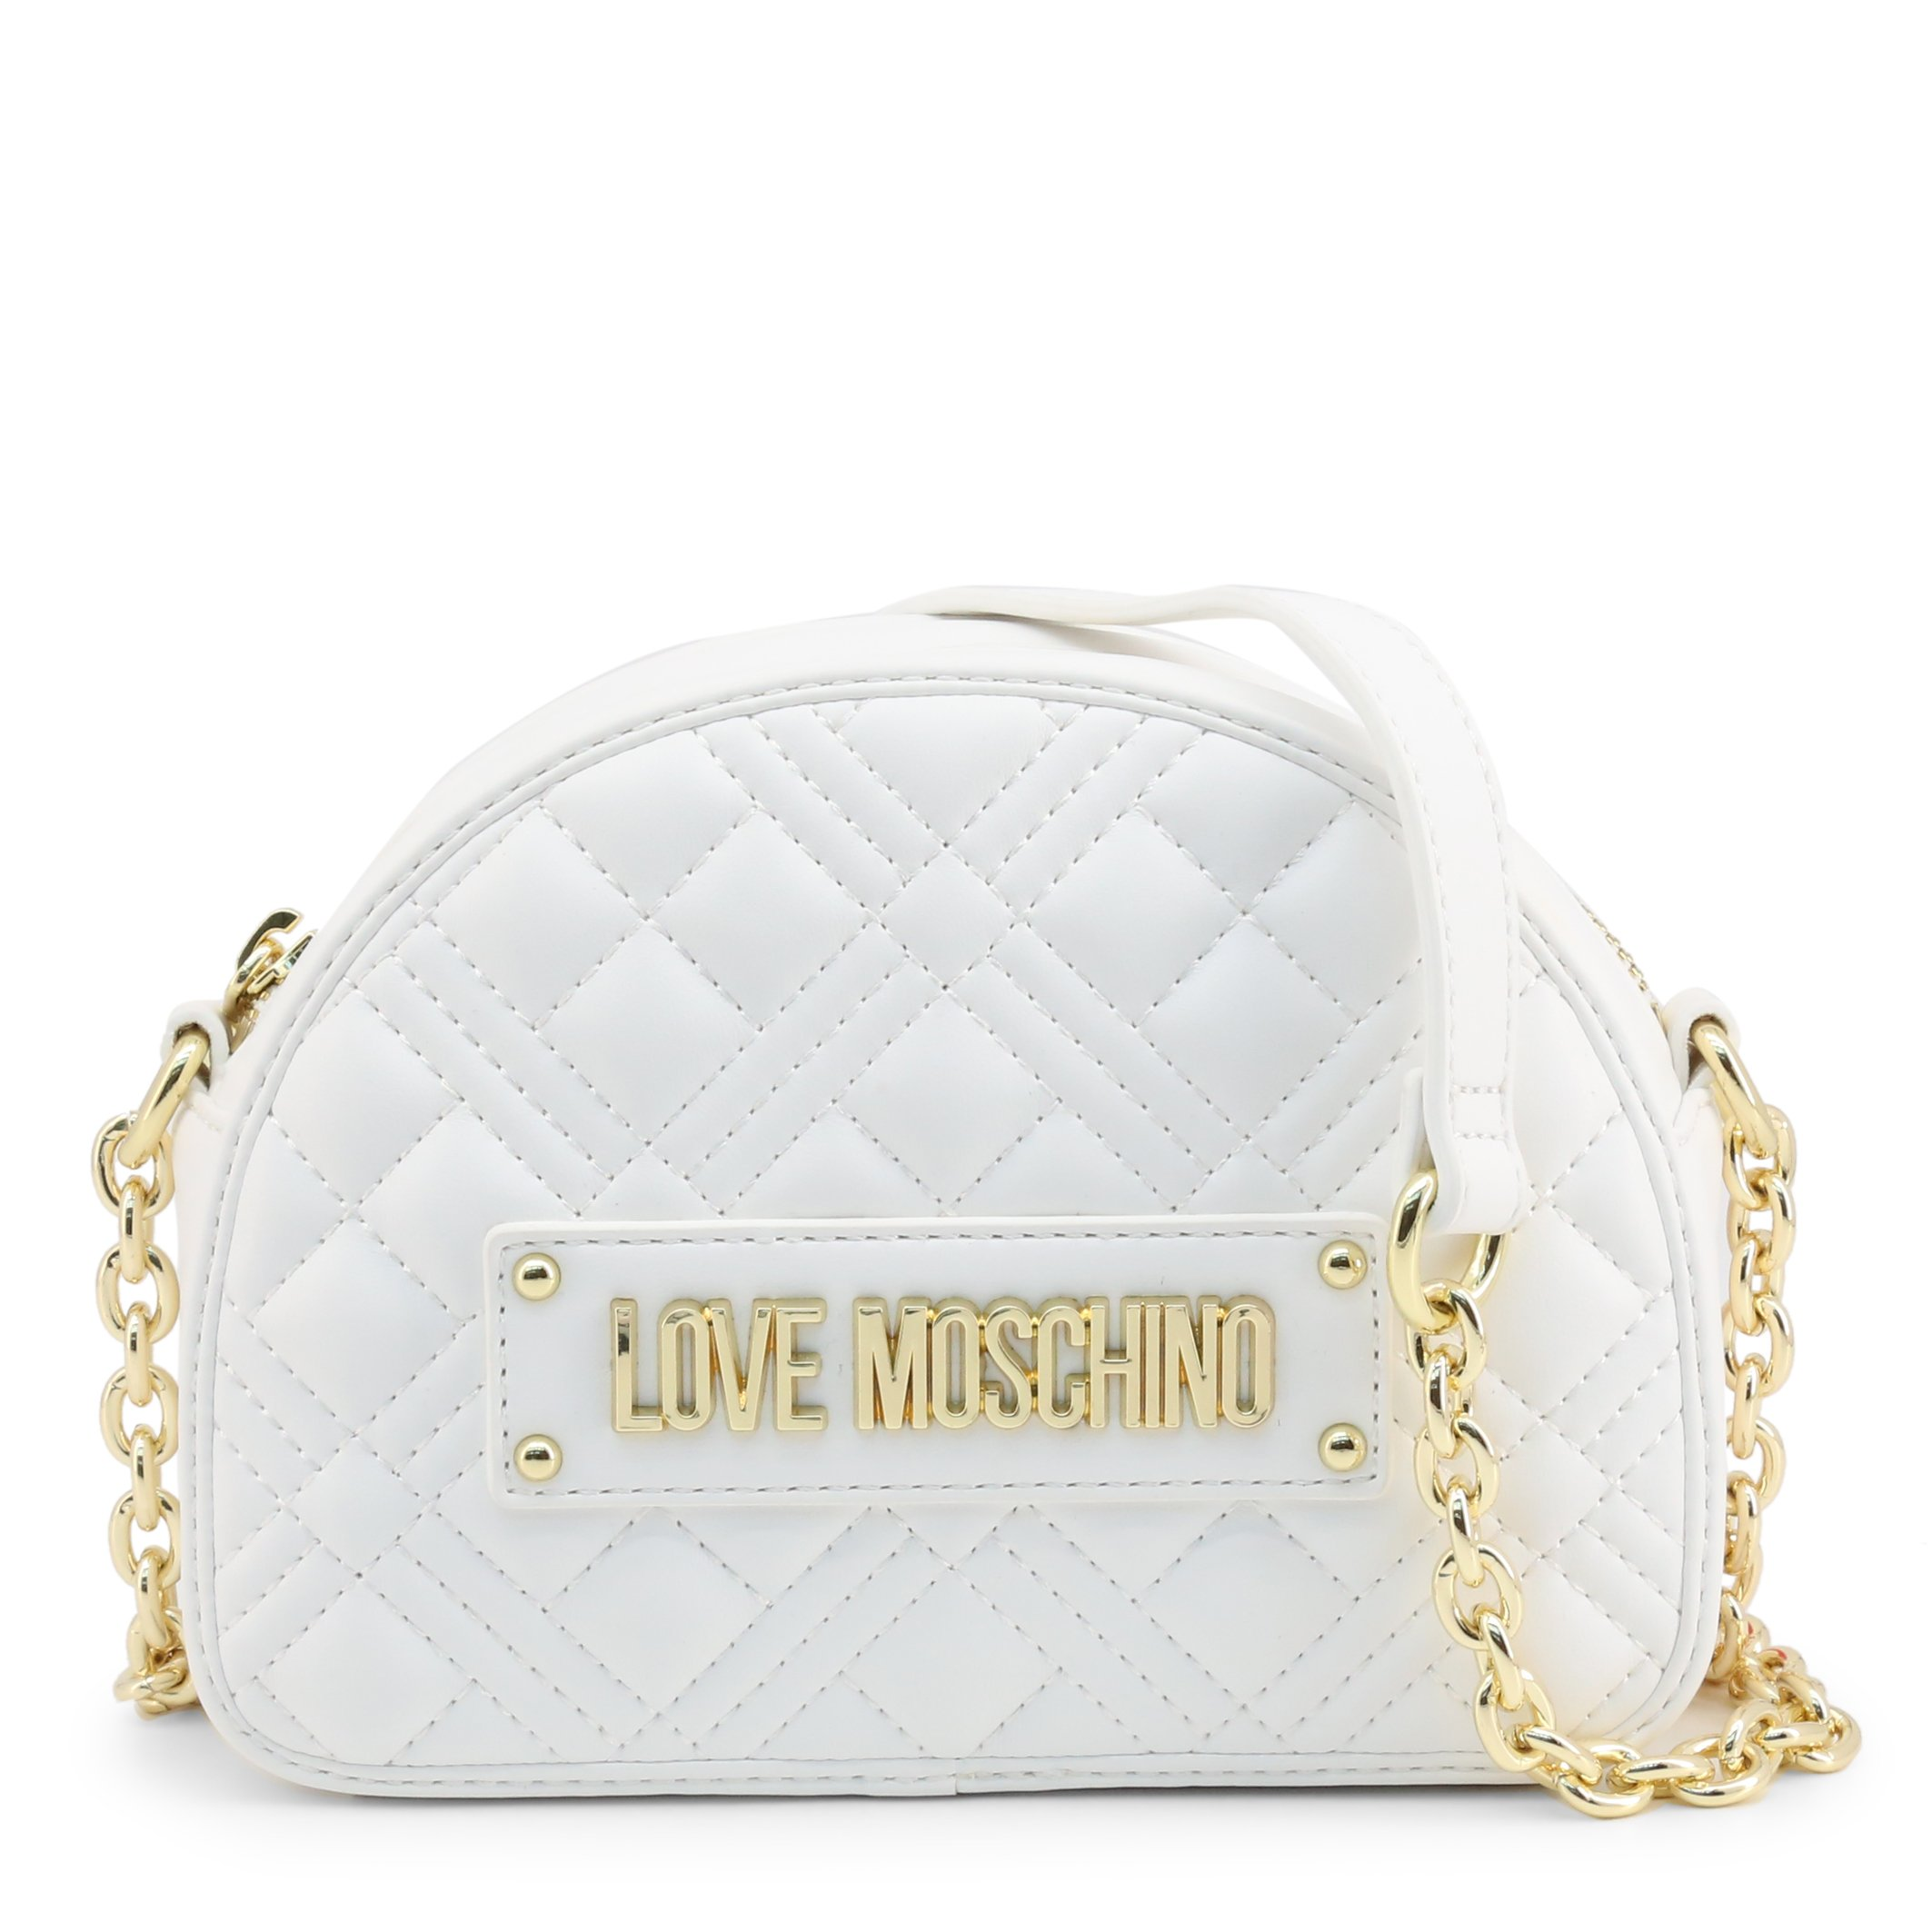 Love Moschino Women's Crossbody Bag Black JC4004PP1CLA0 - white NOSIZE